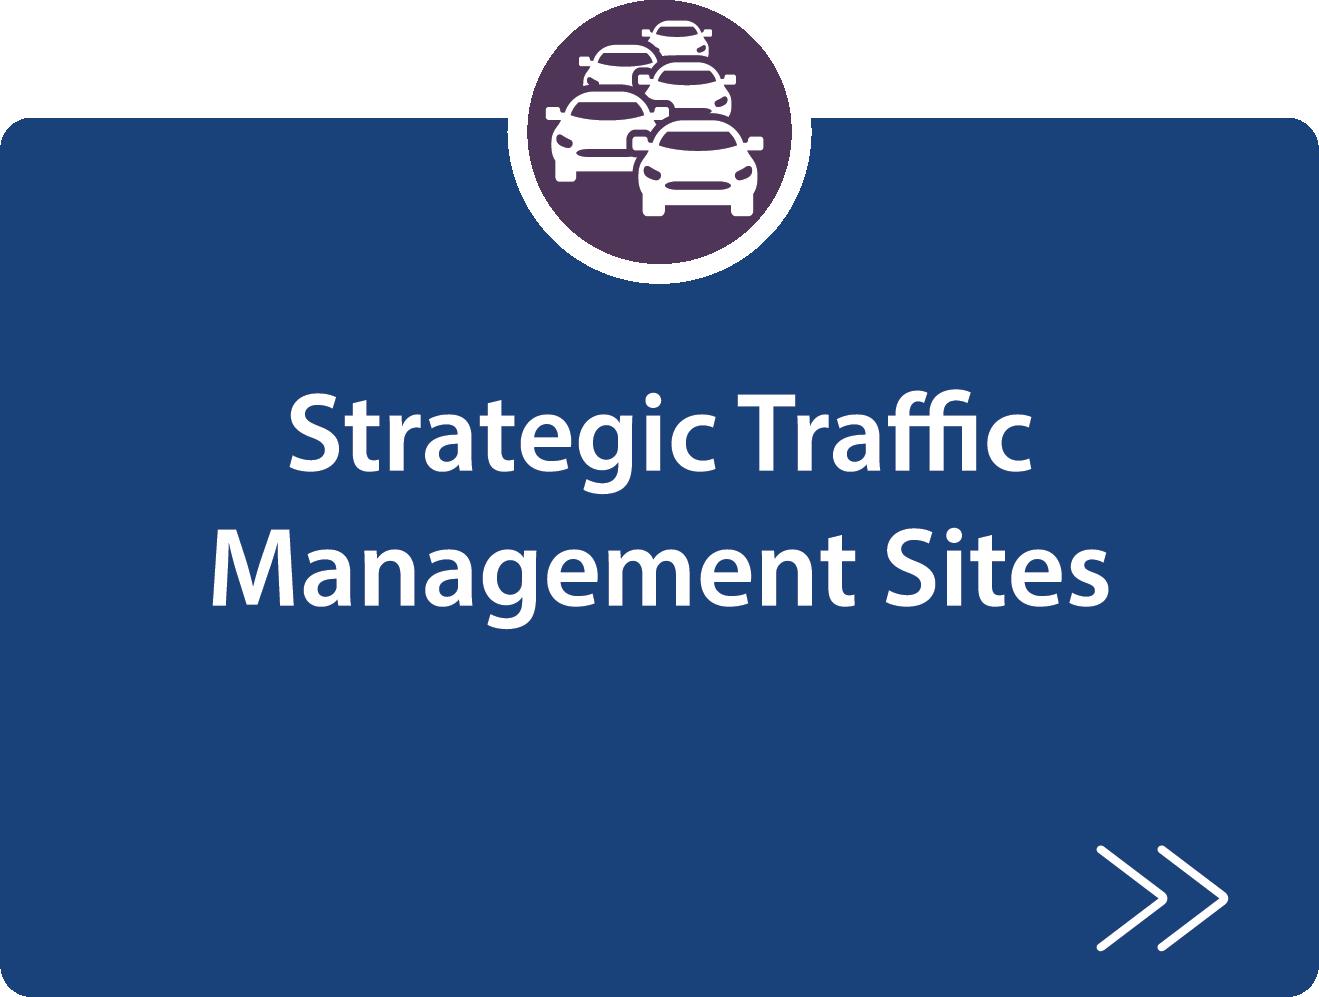 Strategic Traffic Management Sites strategy description